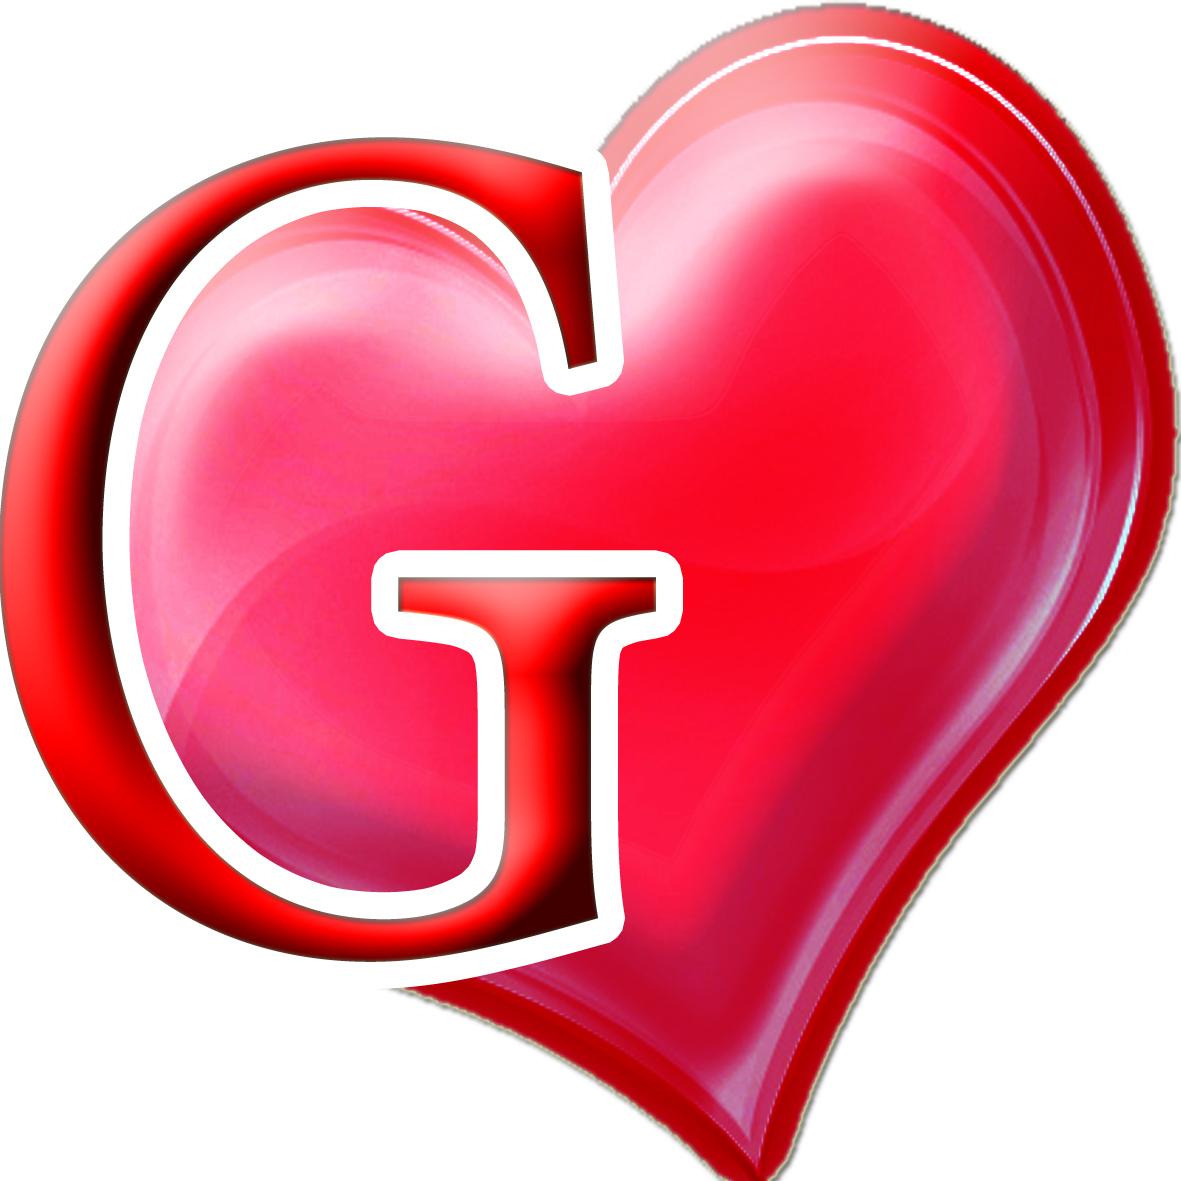 صور حرف G اجمل صور حرف G قلوب فتيات